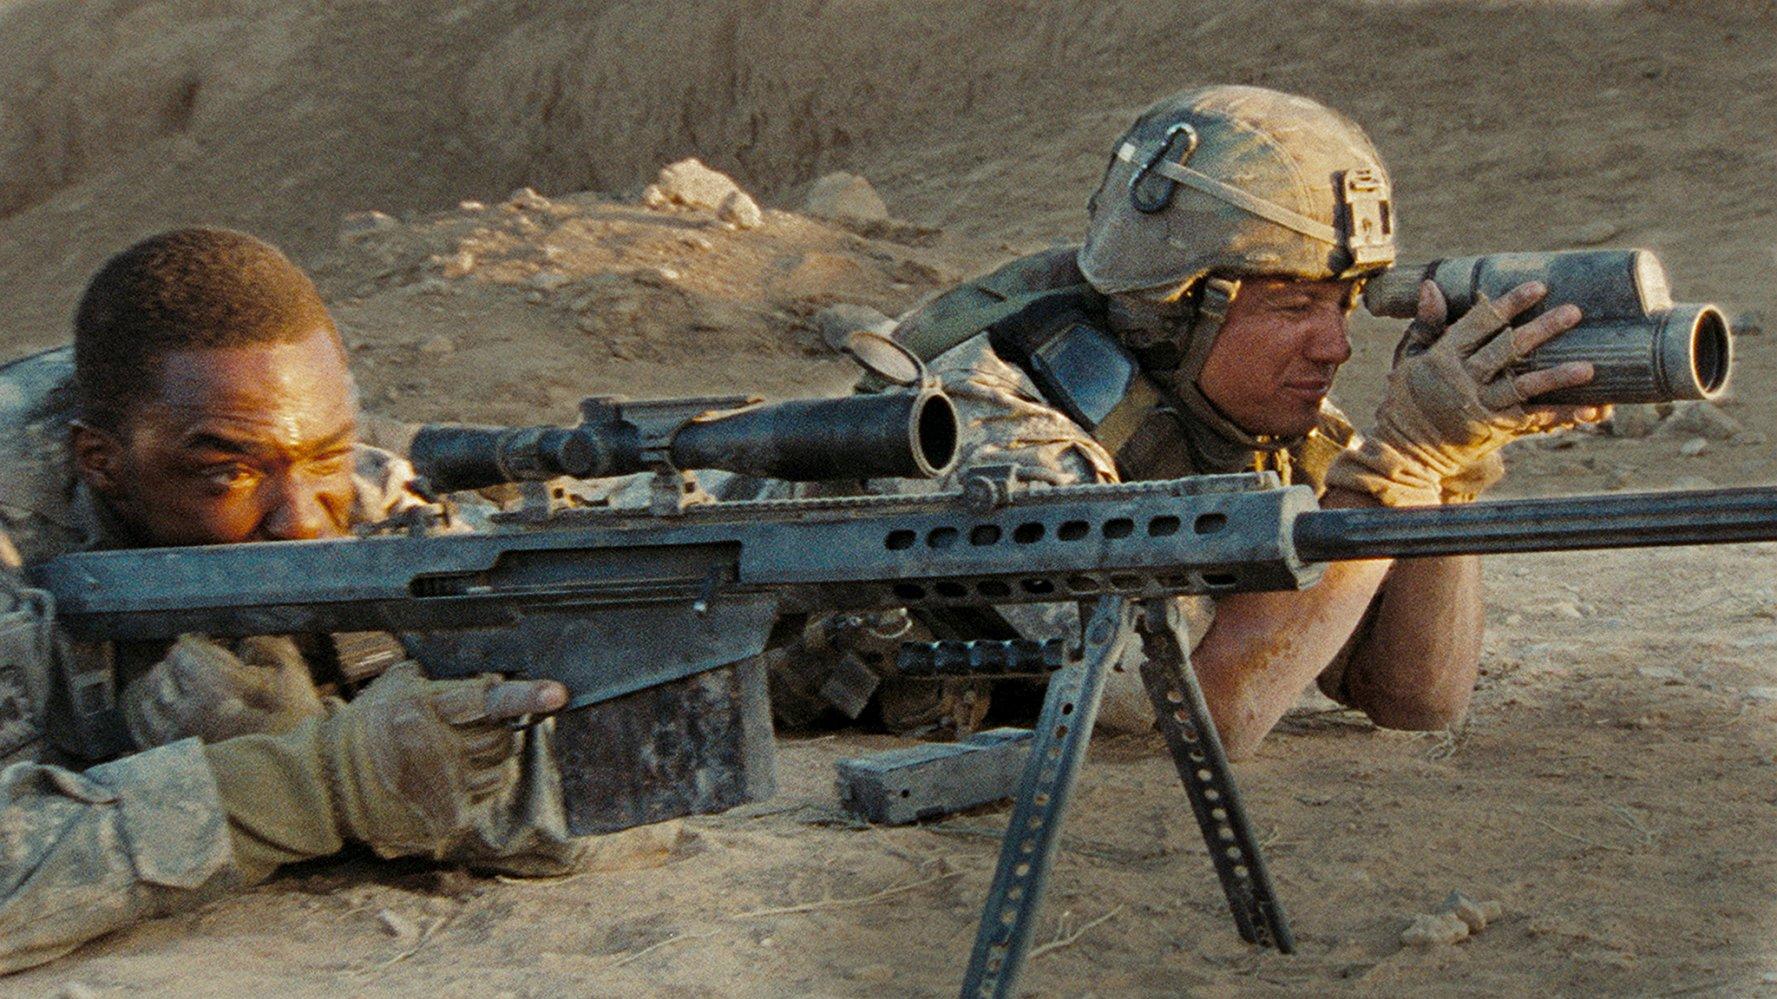 Sergeant JT Sanborn